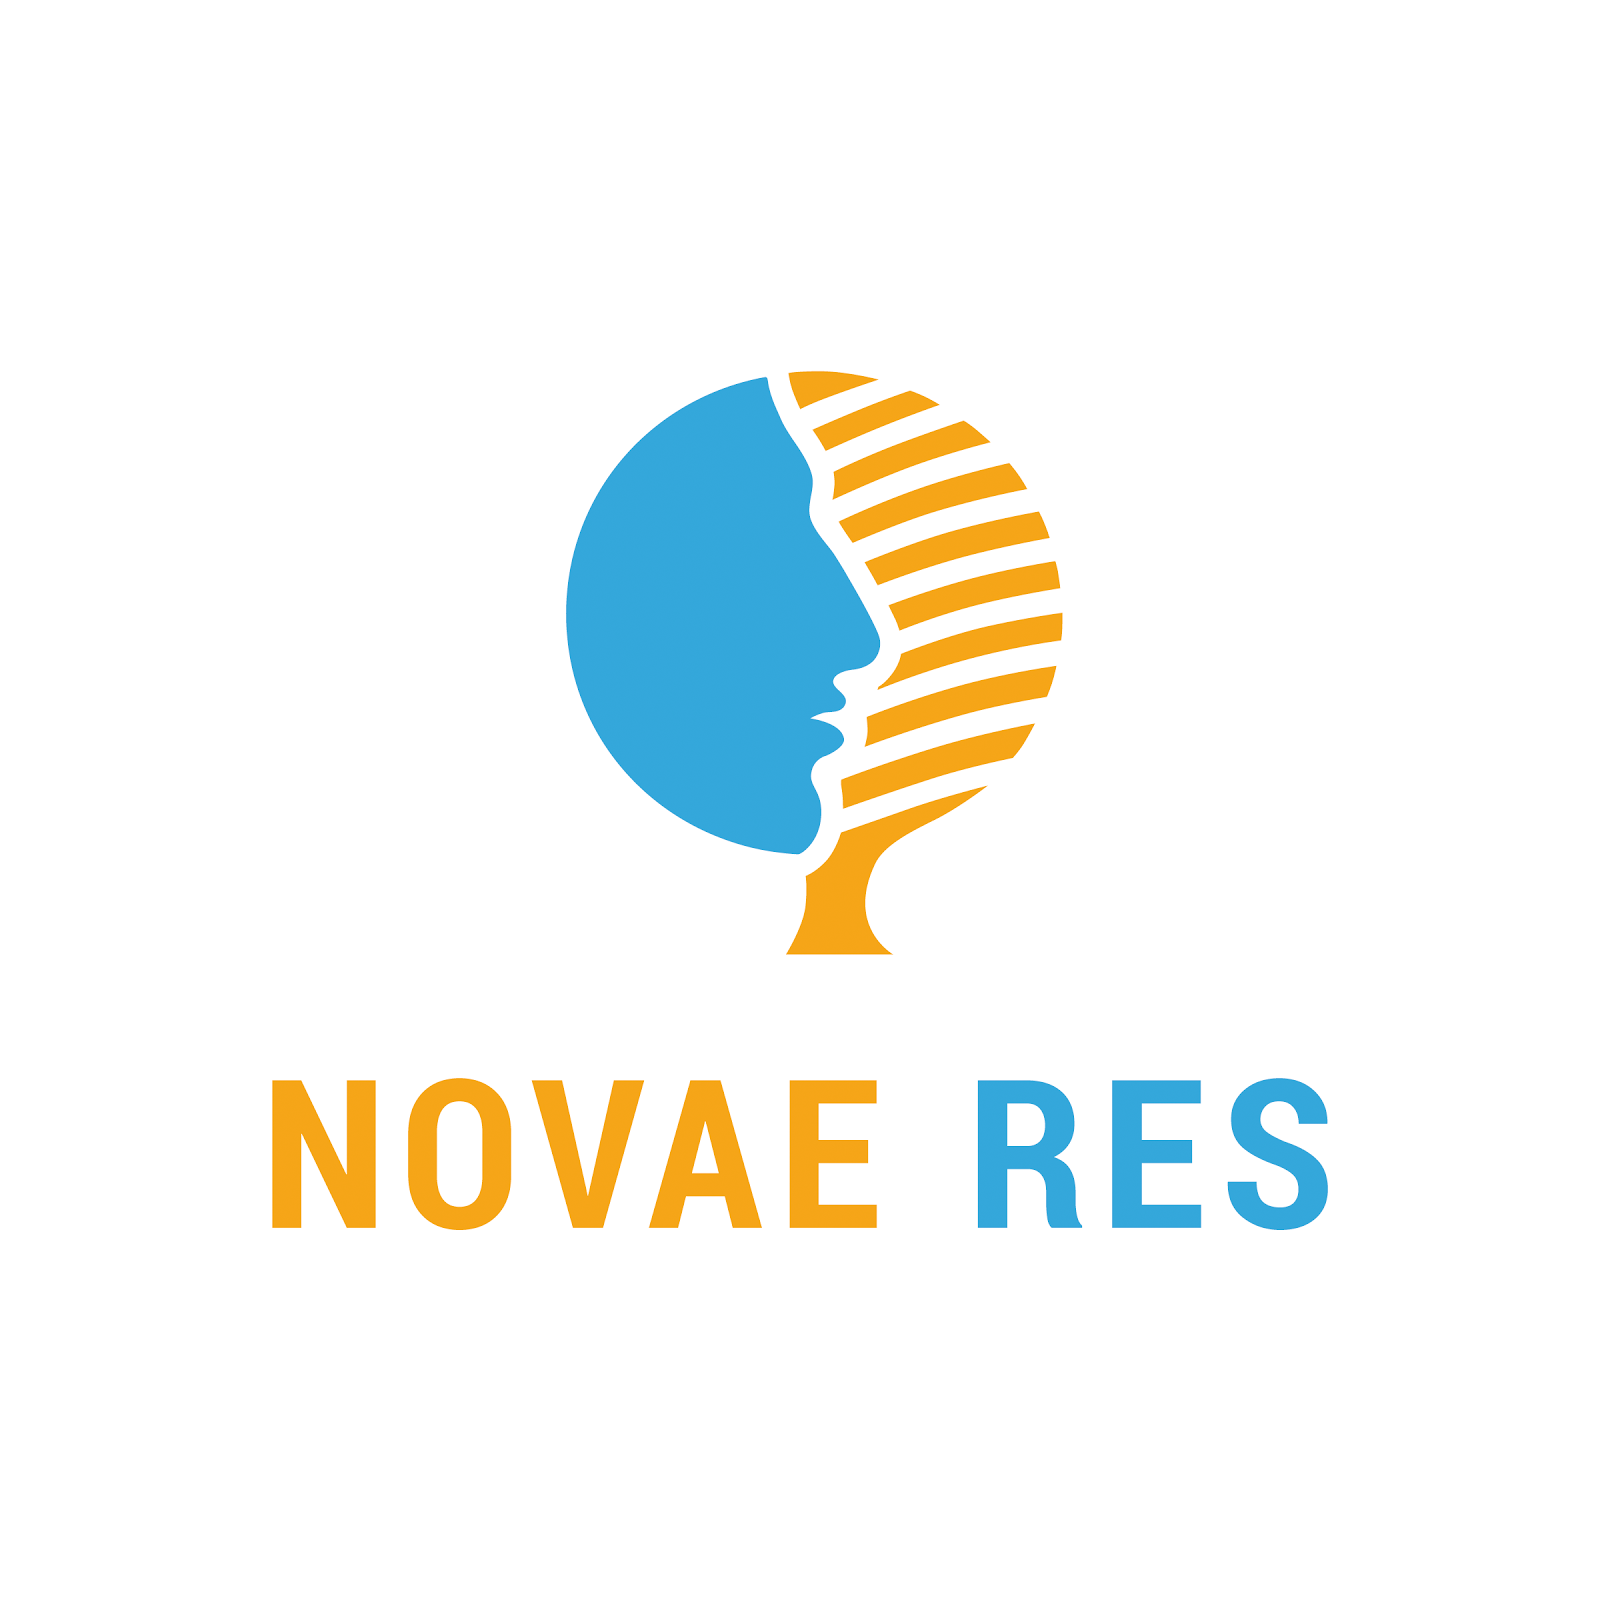 http://www.novaeres.pl/